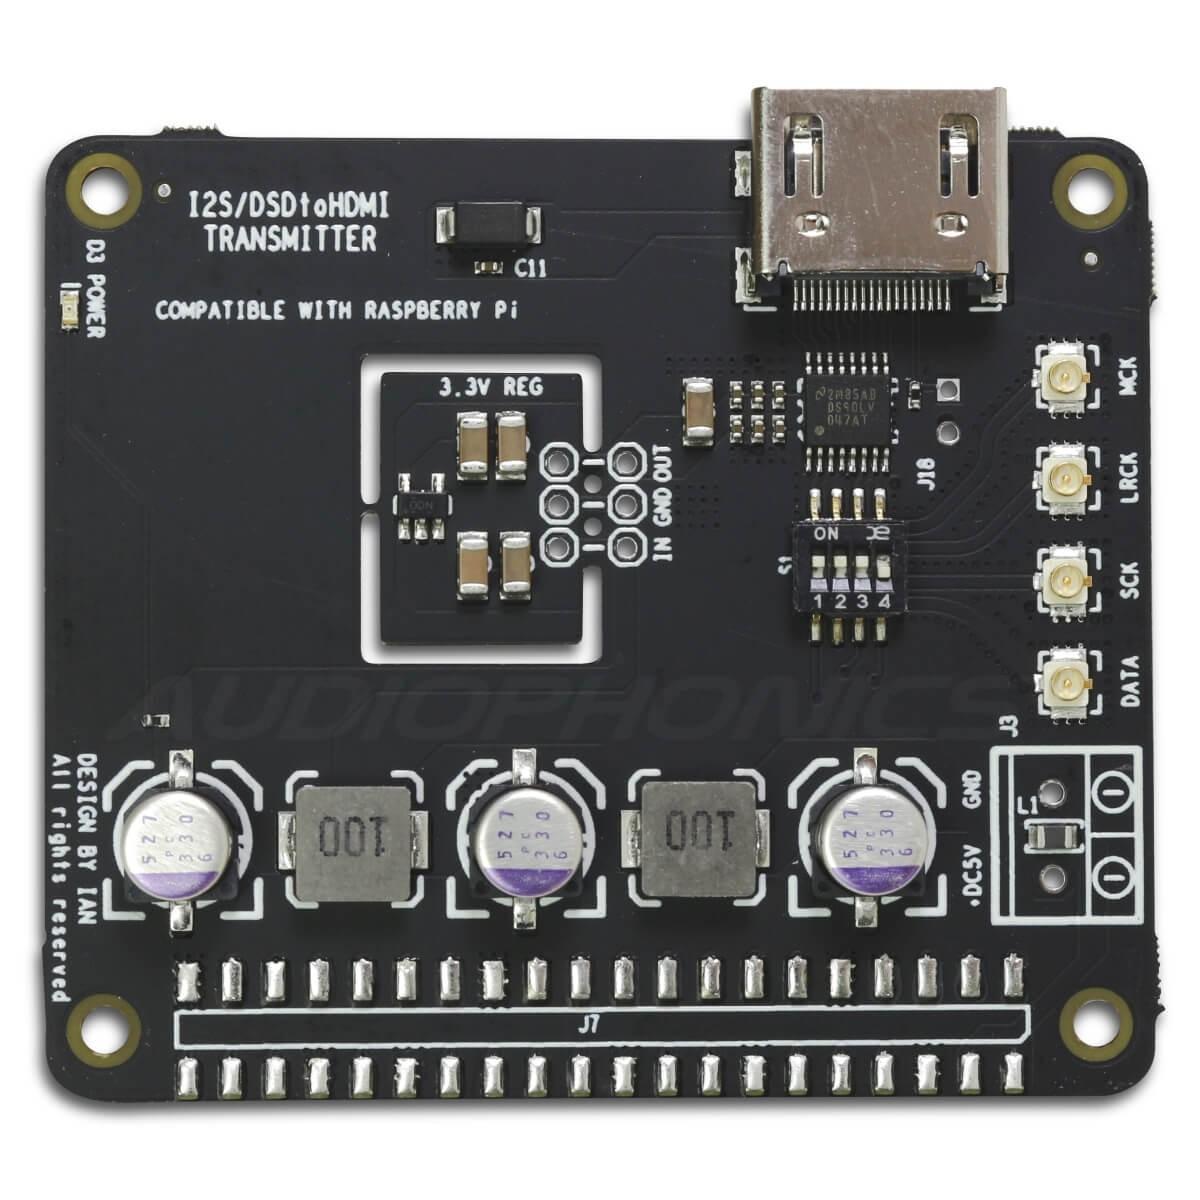 IAN CANADA HDMIpi Transmitter I2S / DSD / DoP to HDMI